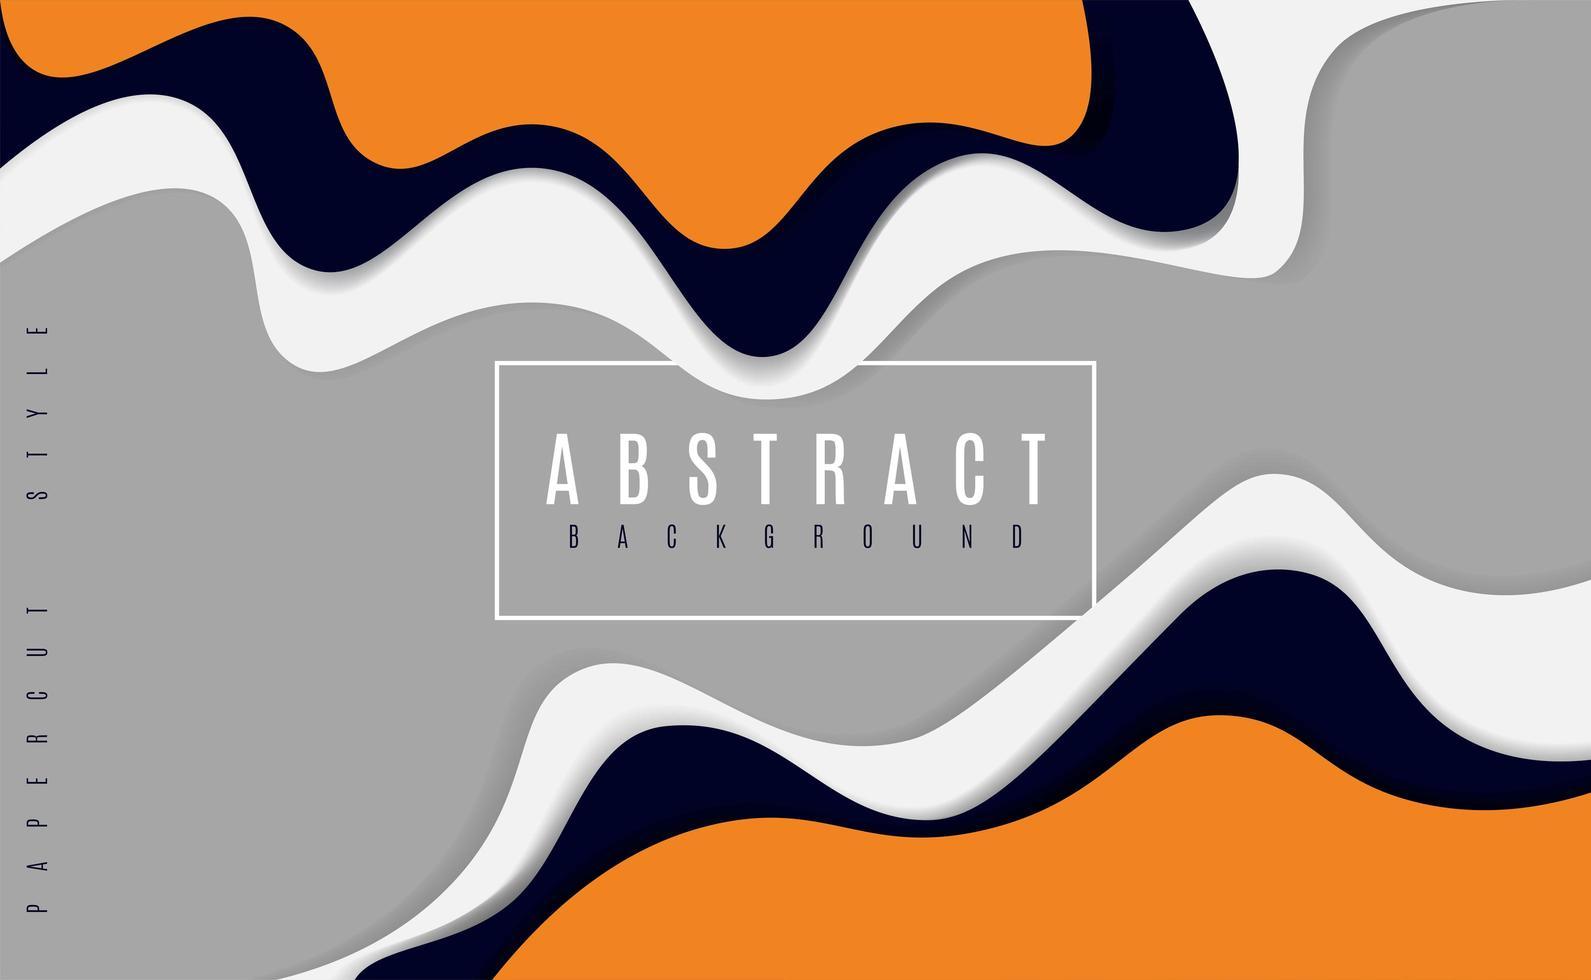 diseño abstracto ondulado en capas de papel cortado vector